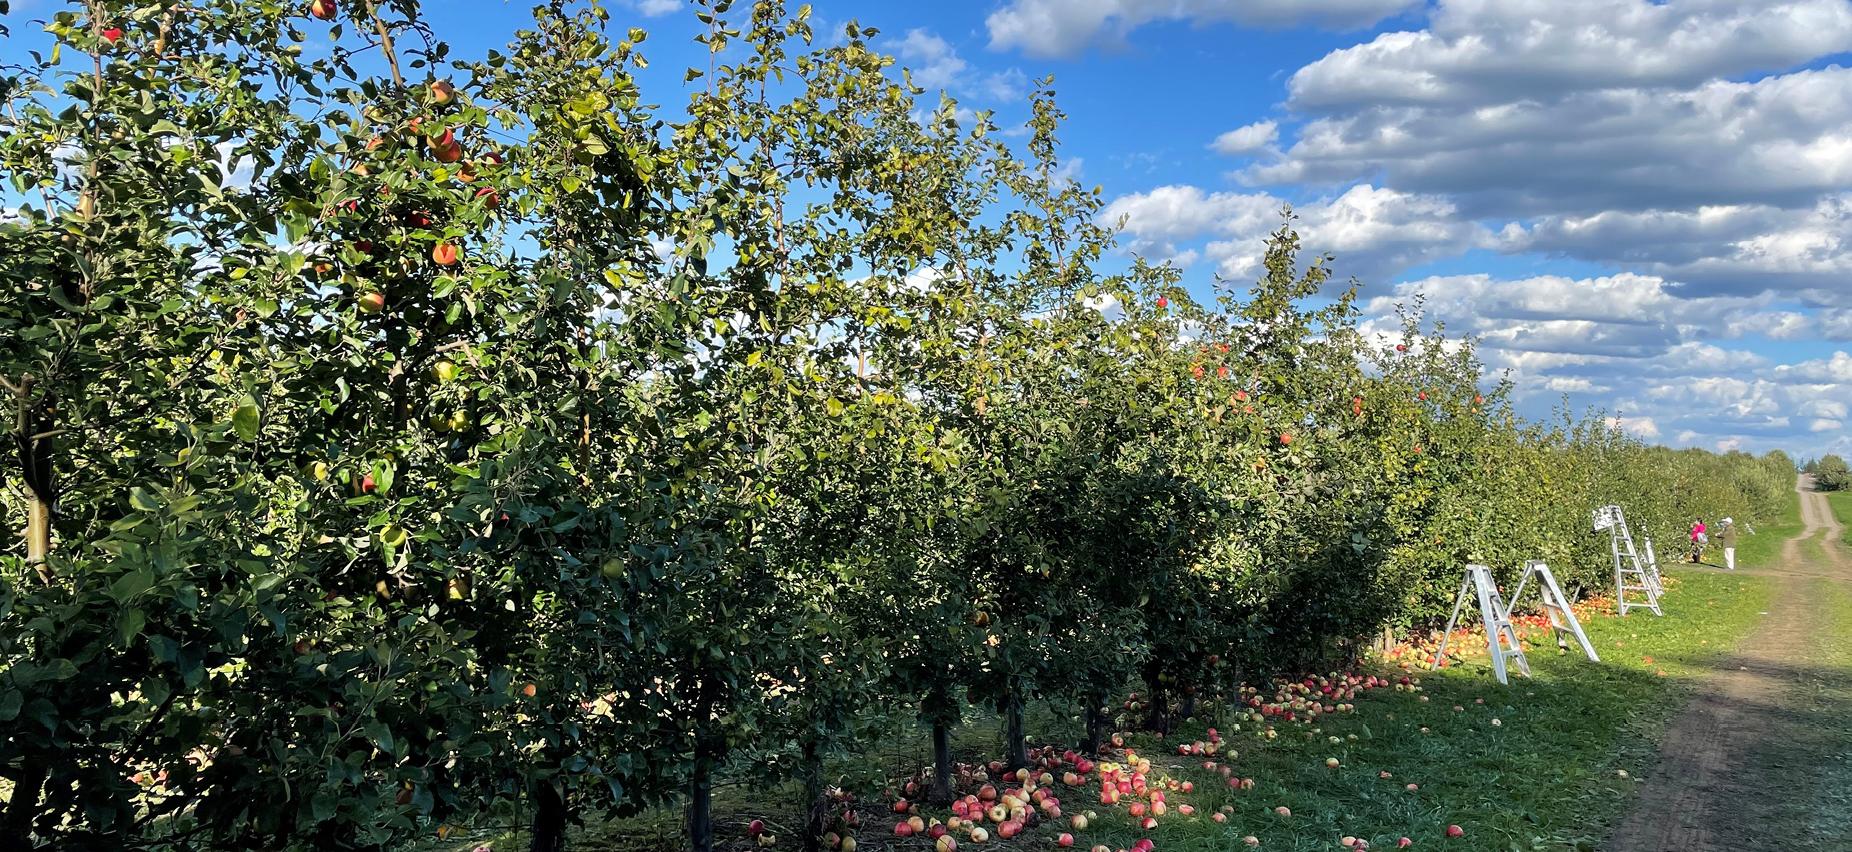 Beak & Skiff Apple Orchard